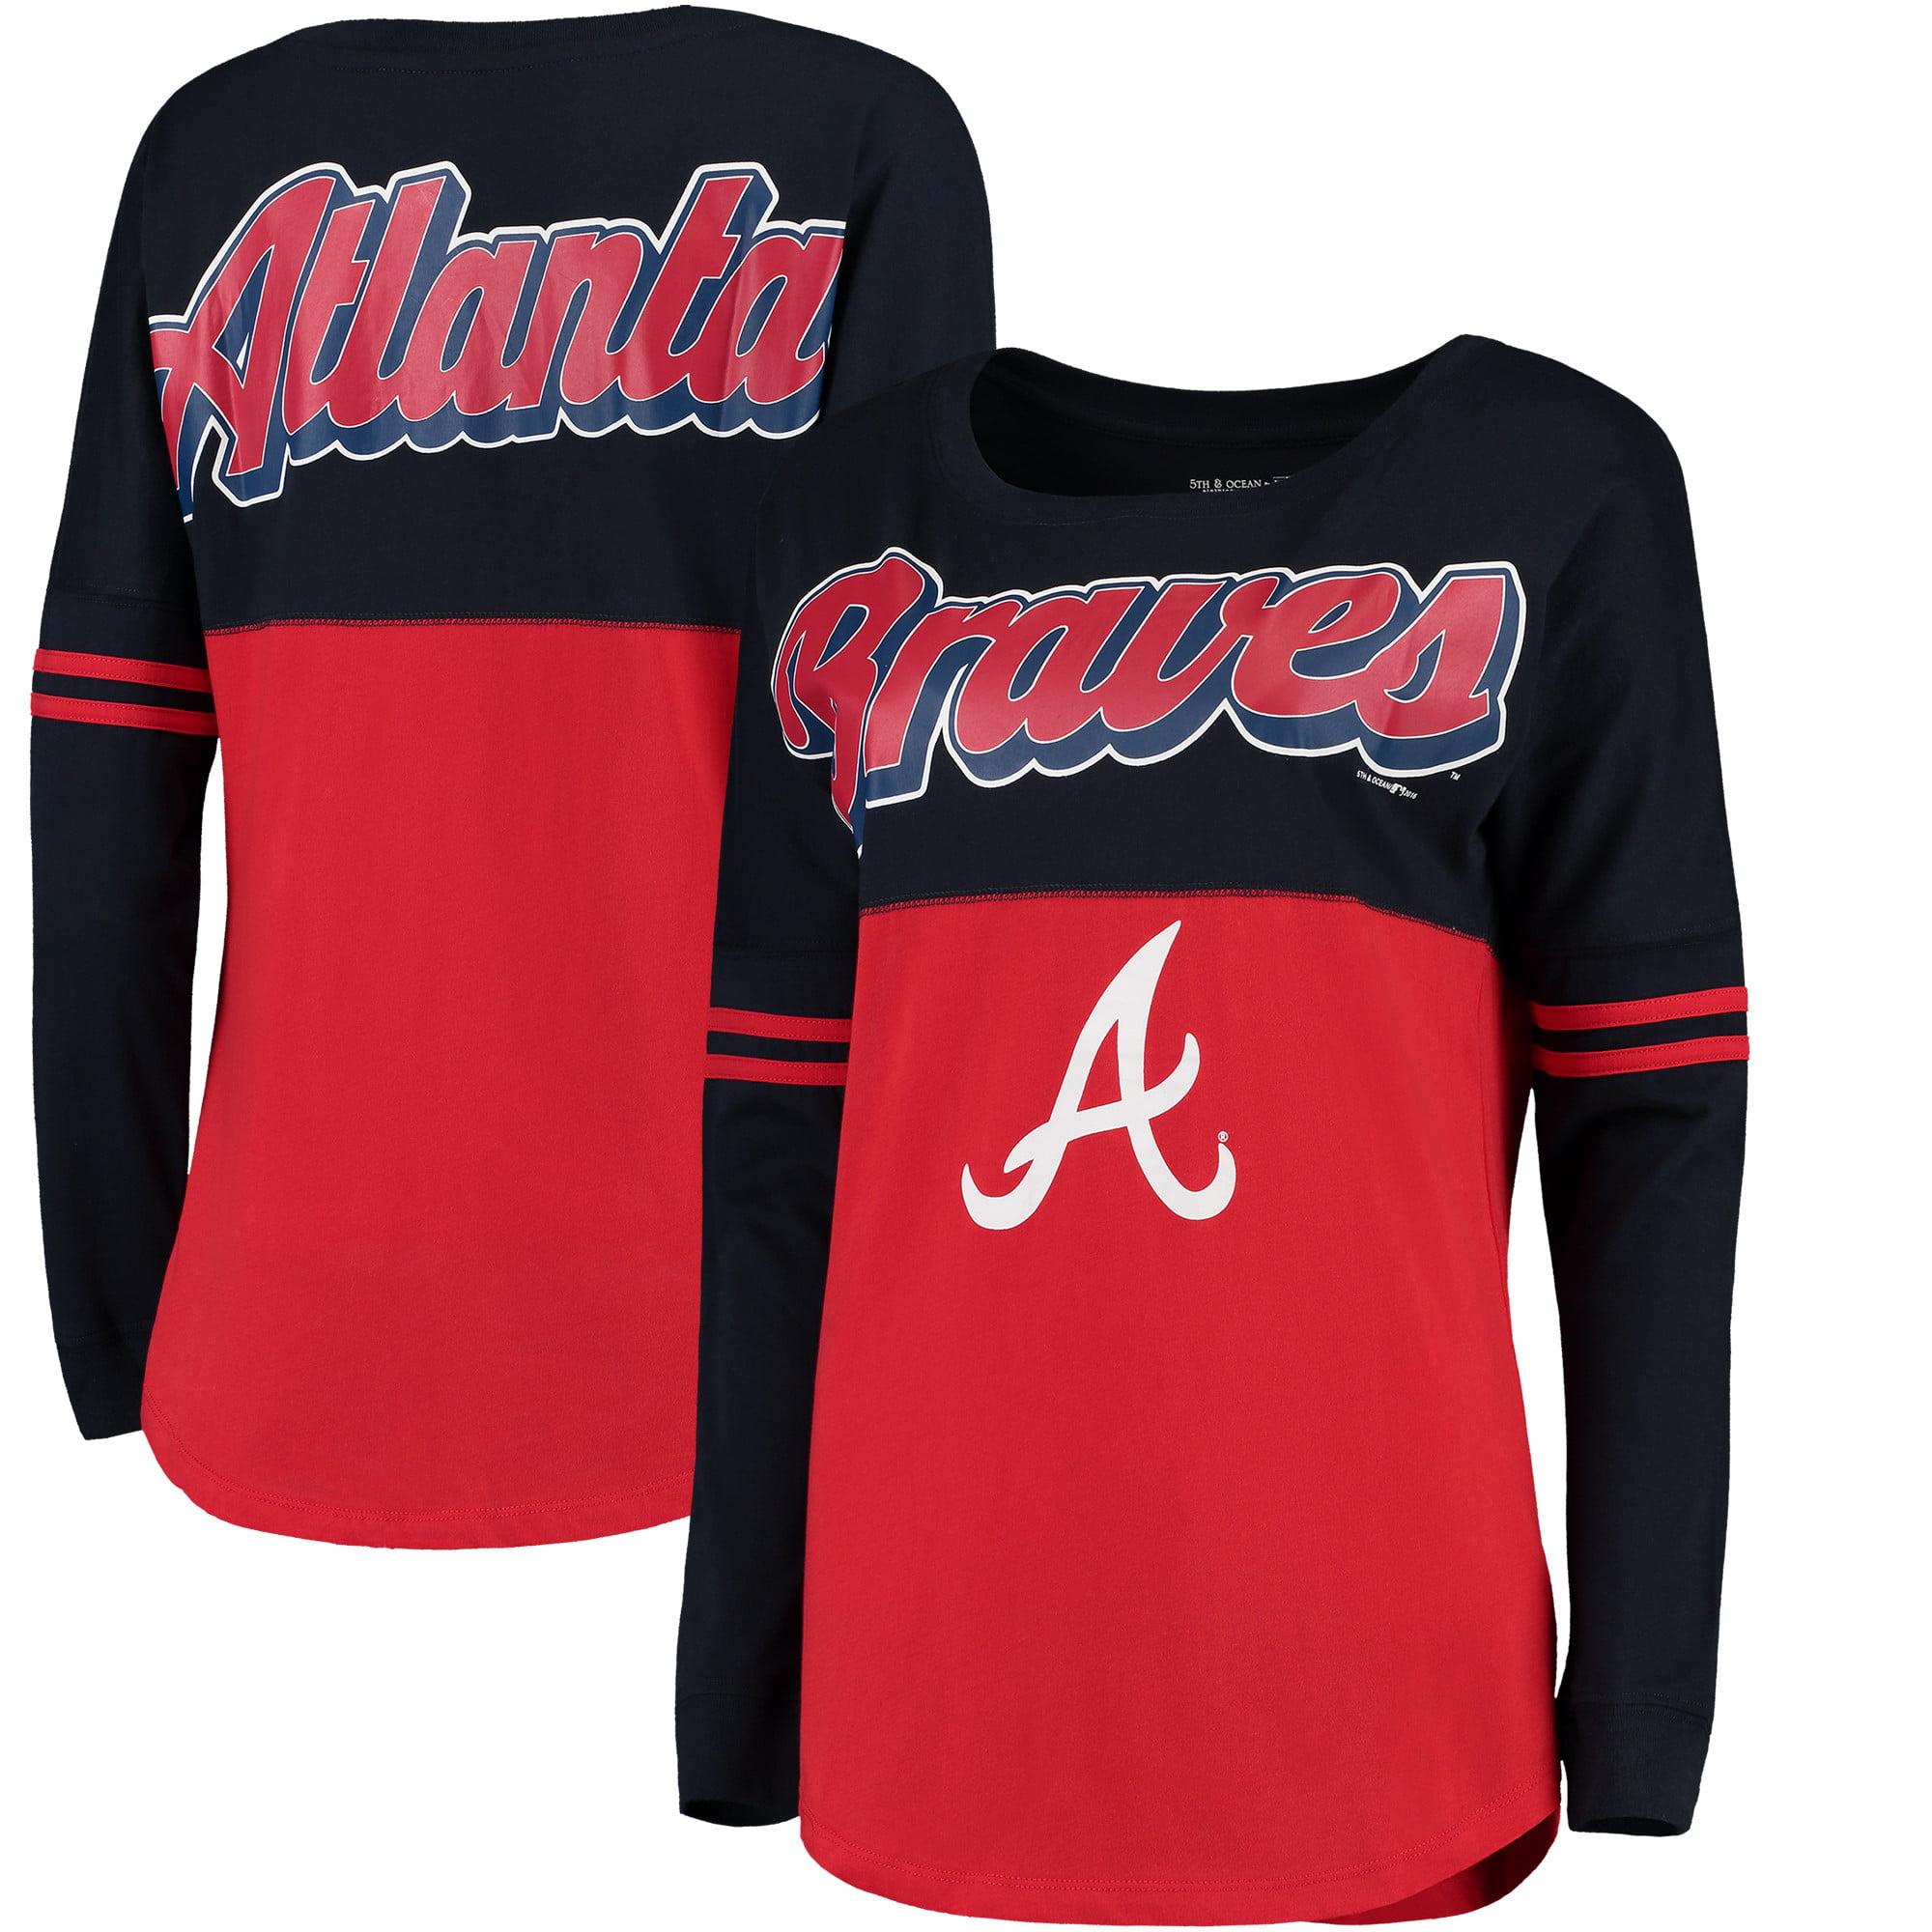 Atlanta Braves 5th & Ocean by New Era Women's MLB Baby Jersey Varsity Crew Boyfriend Long Sleeve T-Shirt - Red